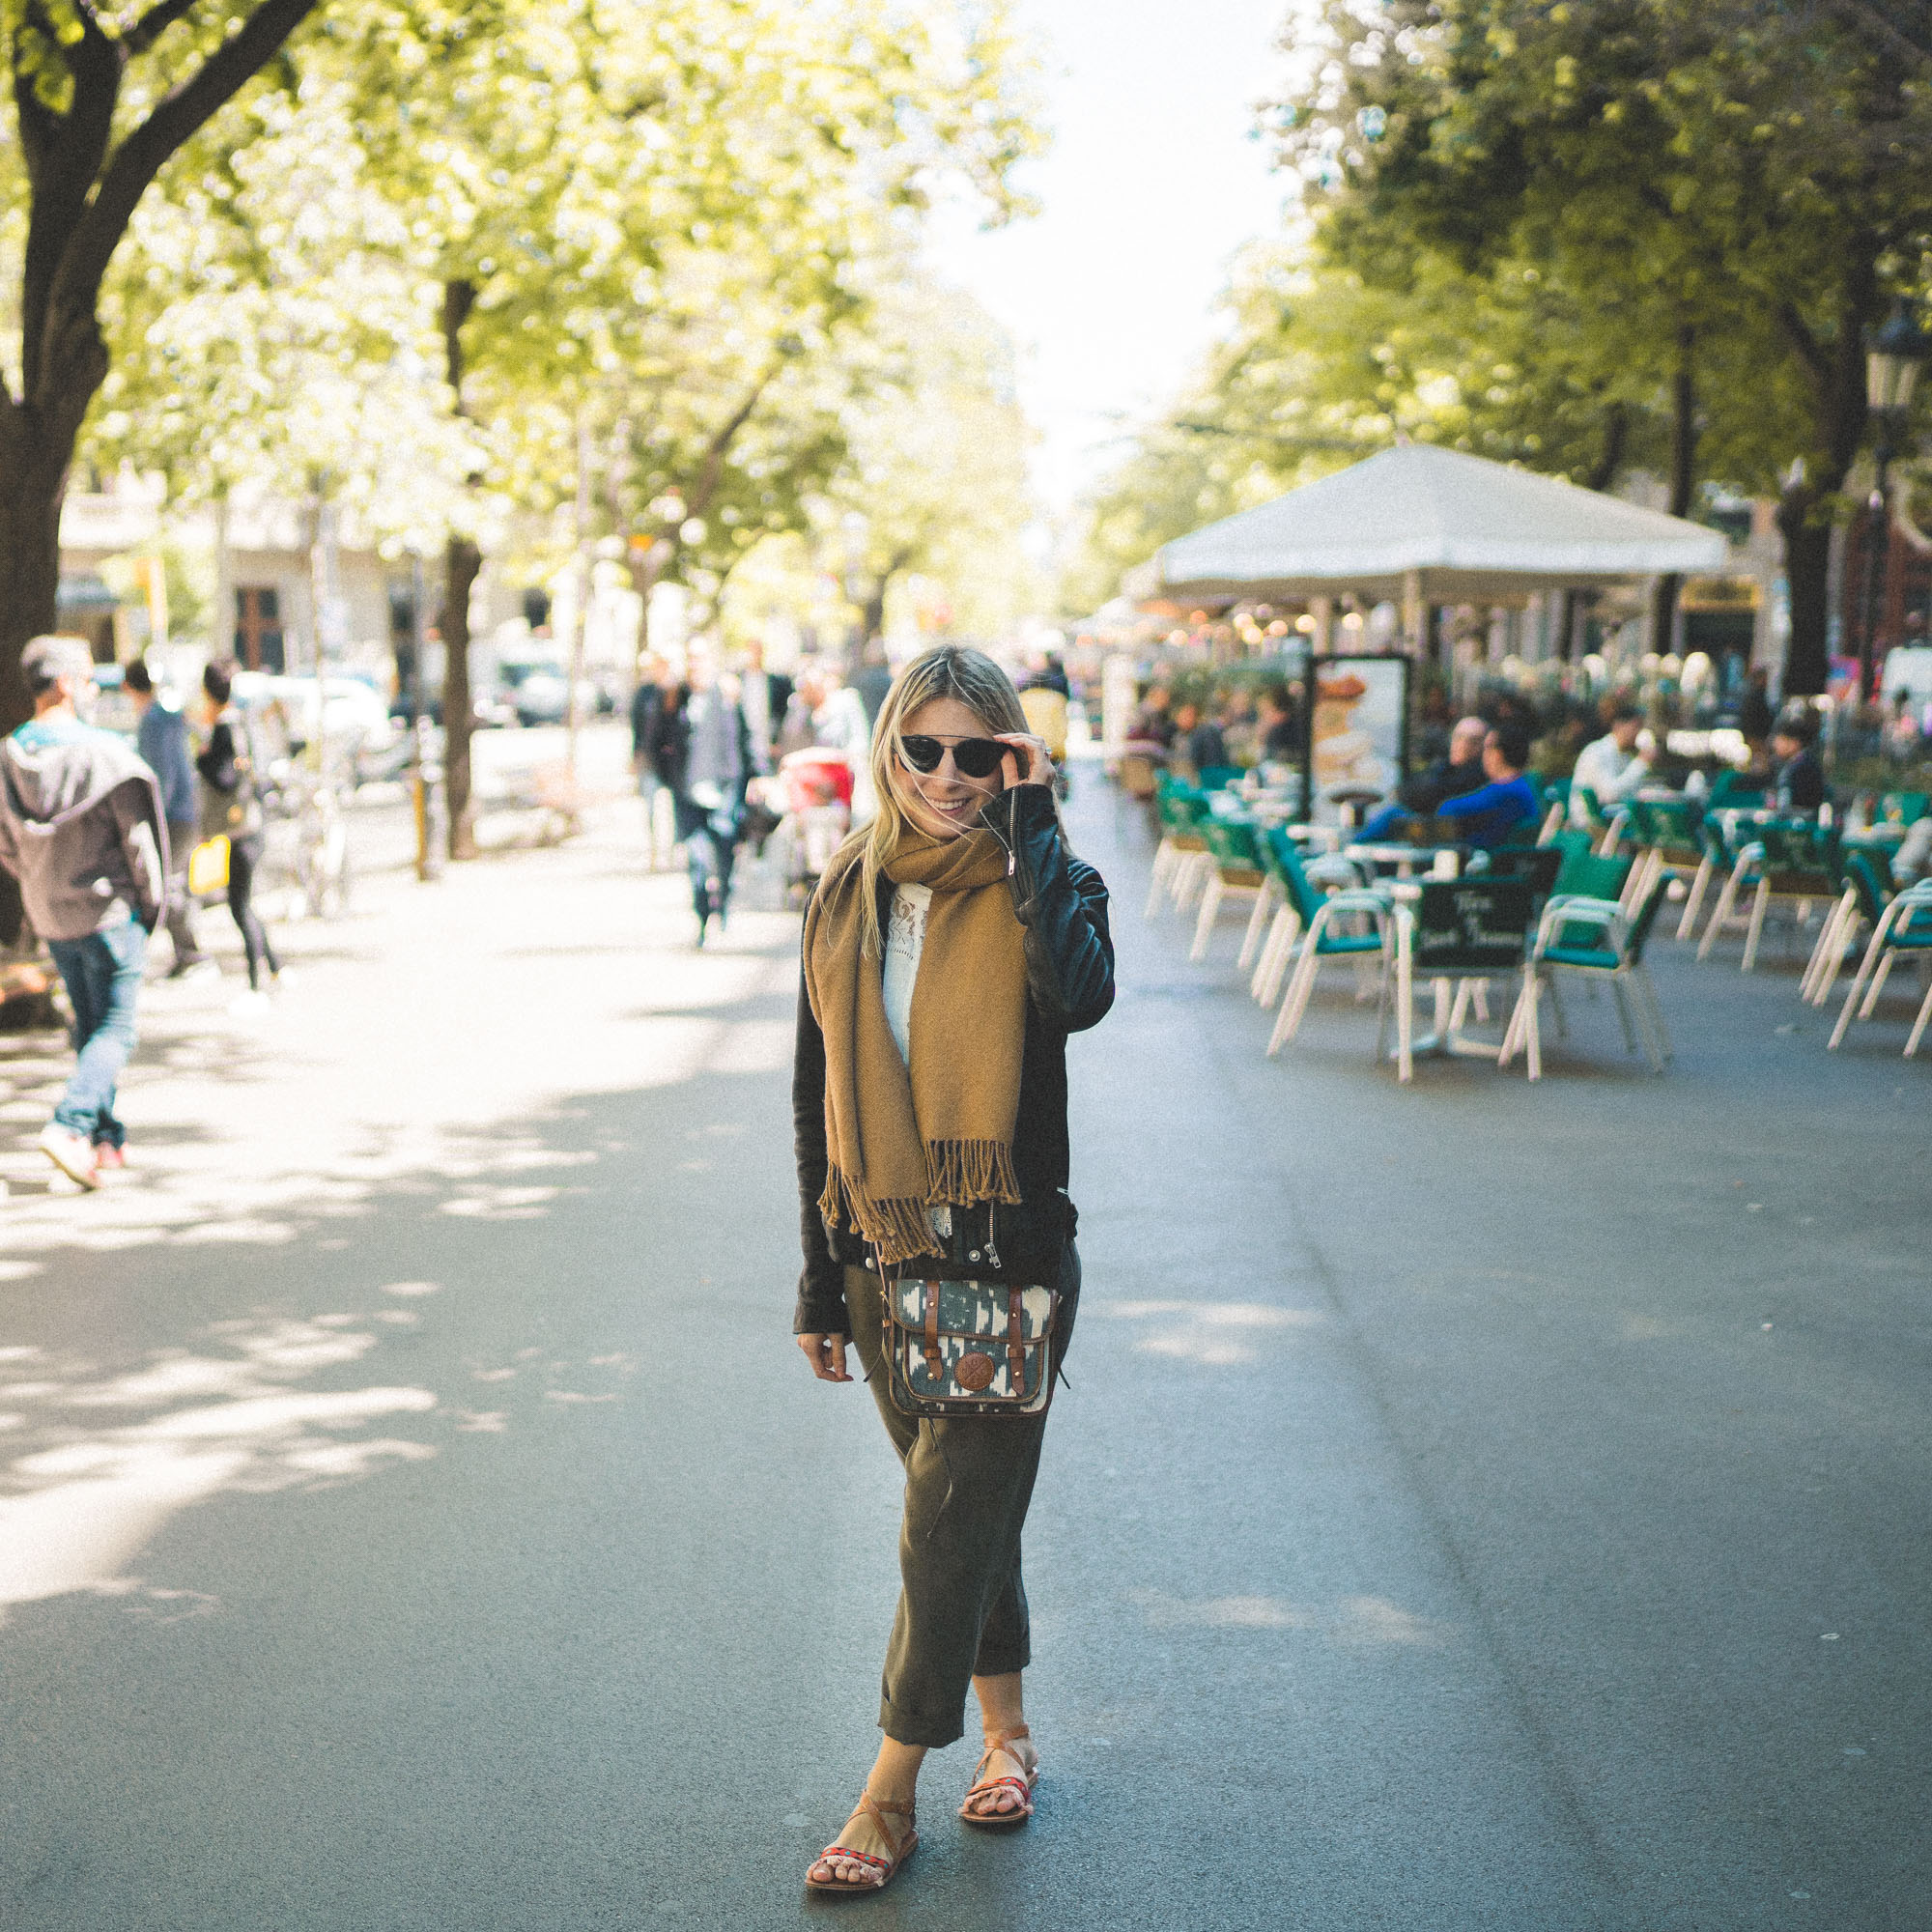 Shopping and eating at La Rambla in Barcelona, Spain